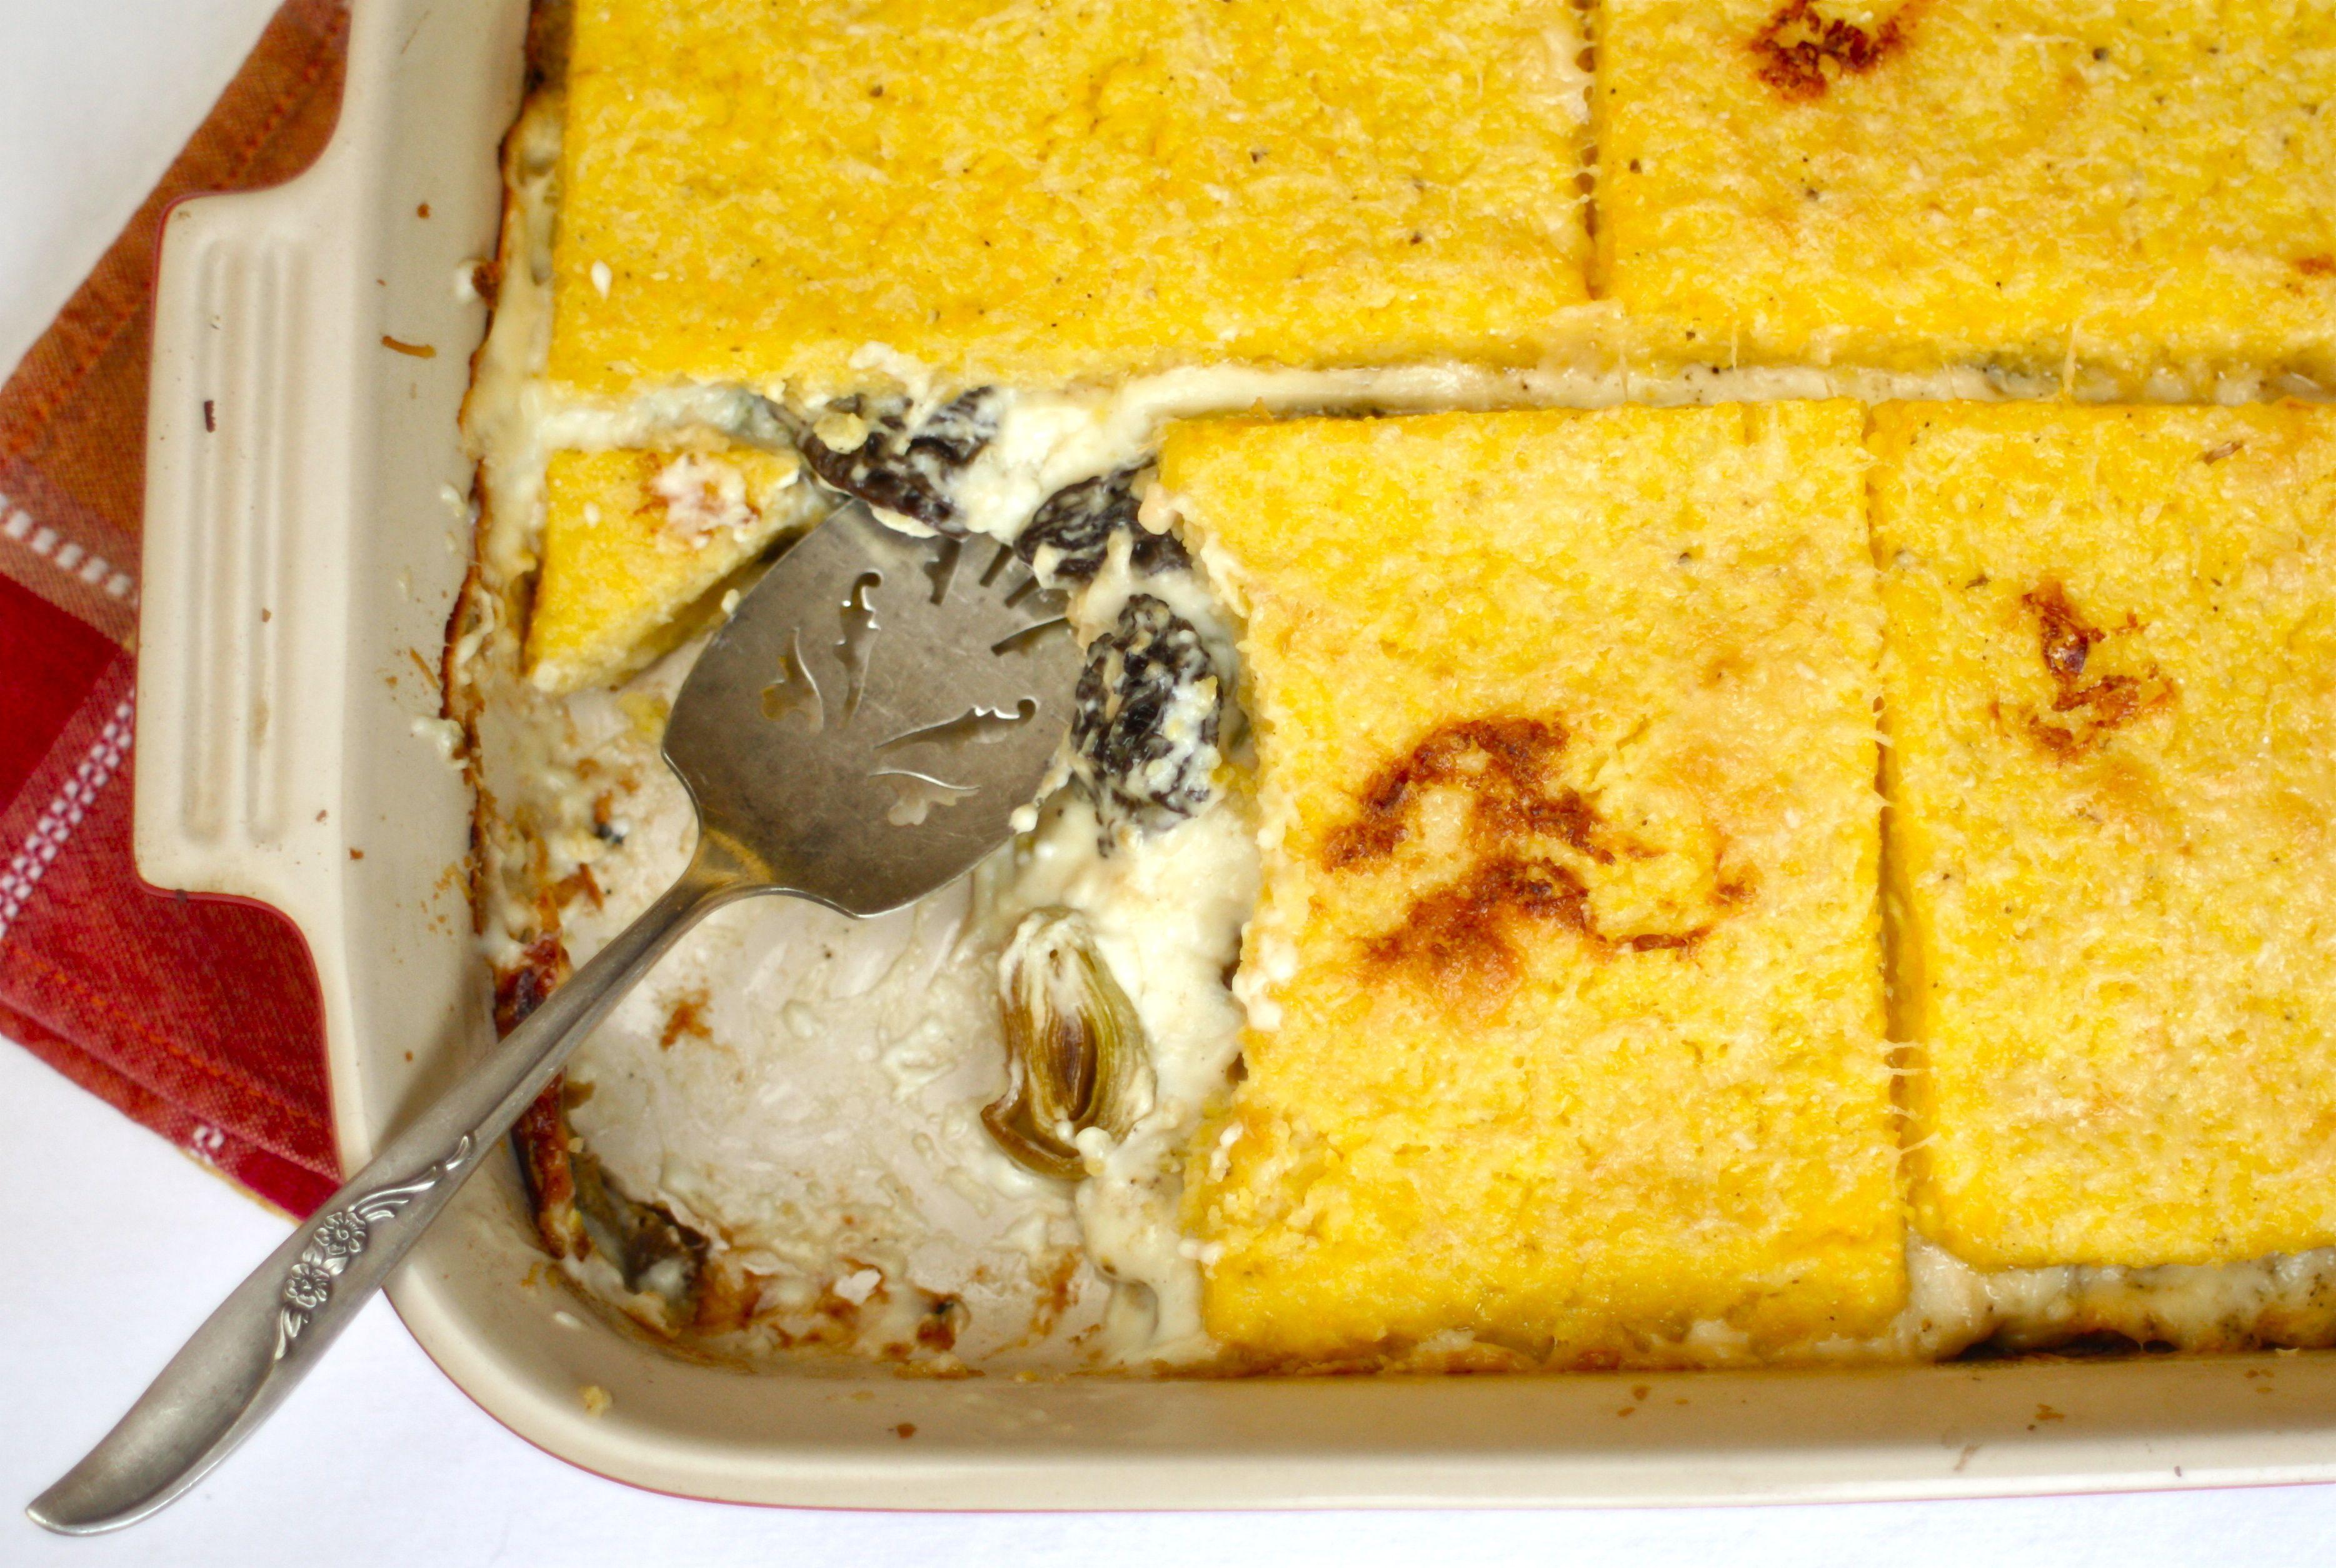 Eggplant And Mushroom Polenta Bake Recipes — Dishmaps